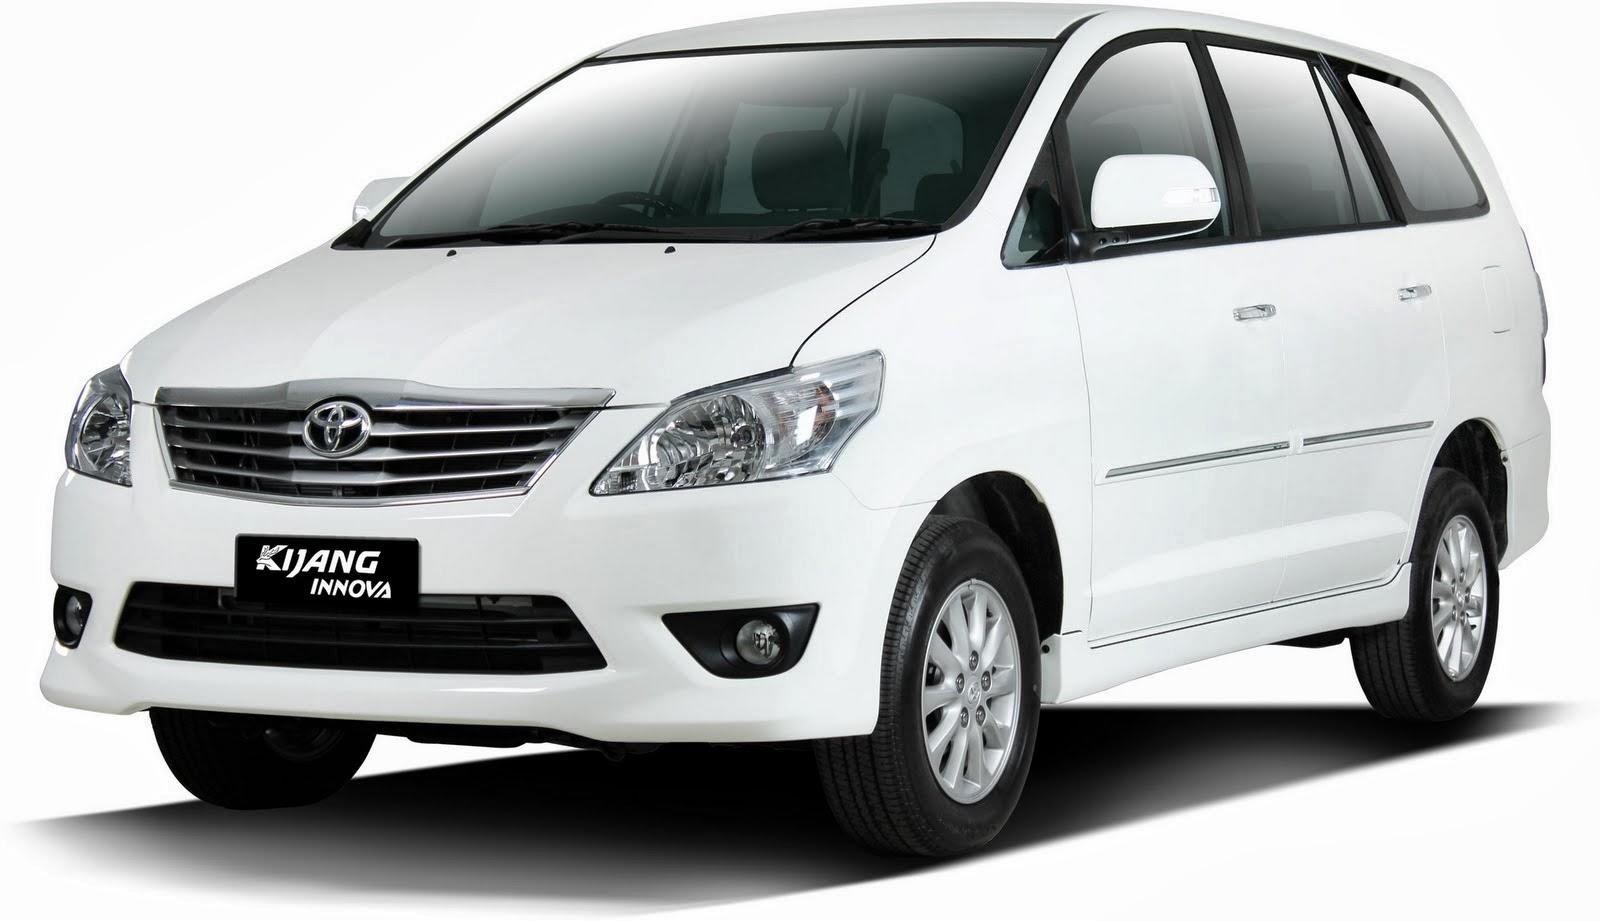 Kijang Innova Type V AT Diesel  Harga  Spesifikasi